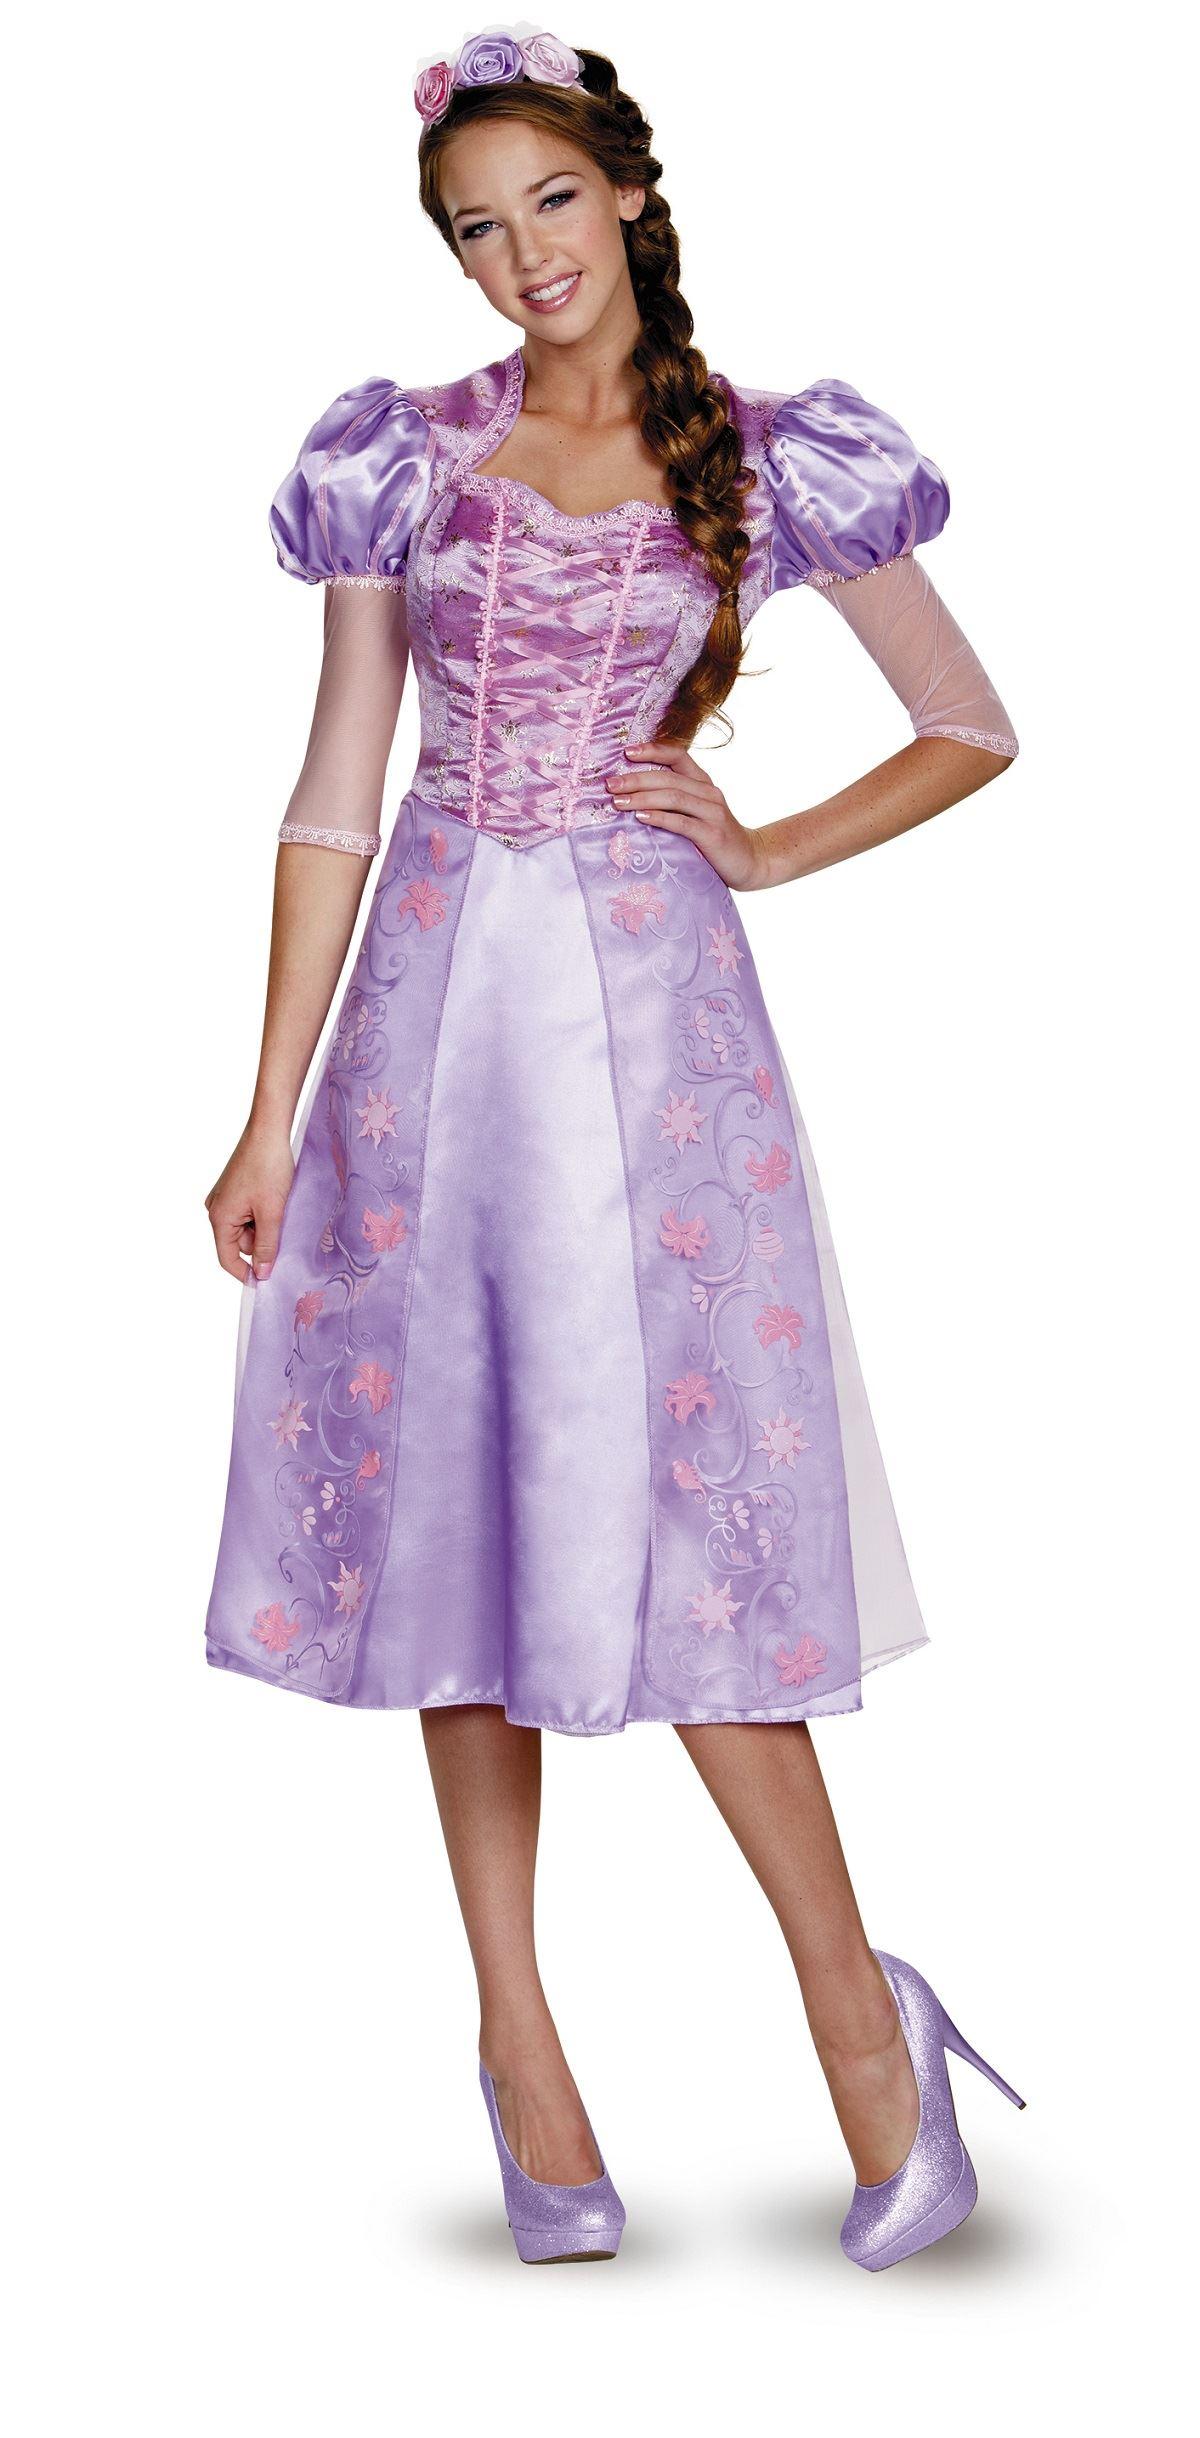 Rapunzel Disney Princess Woman Costume